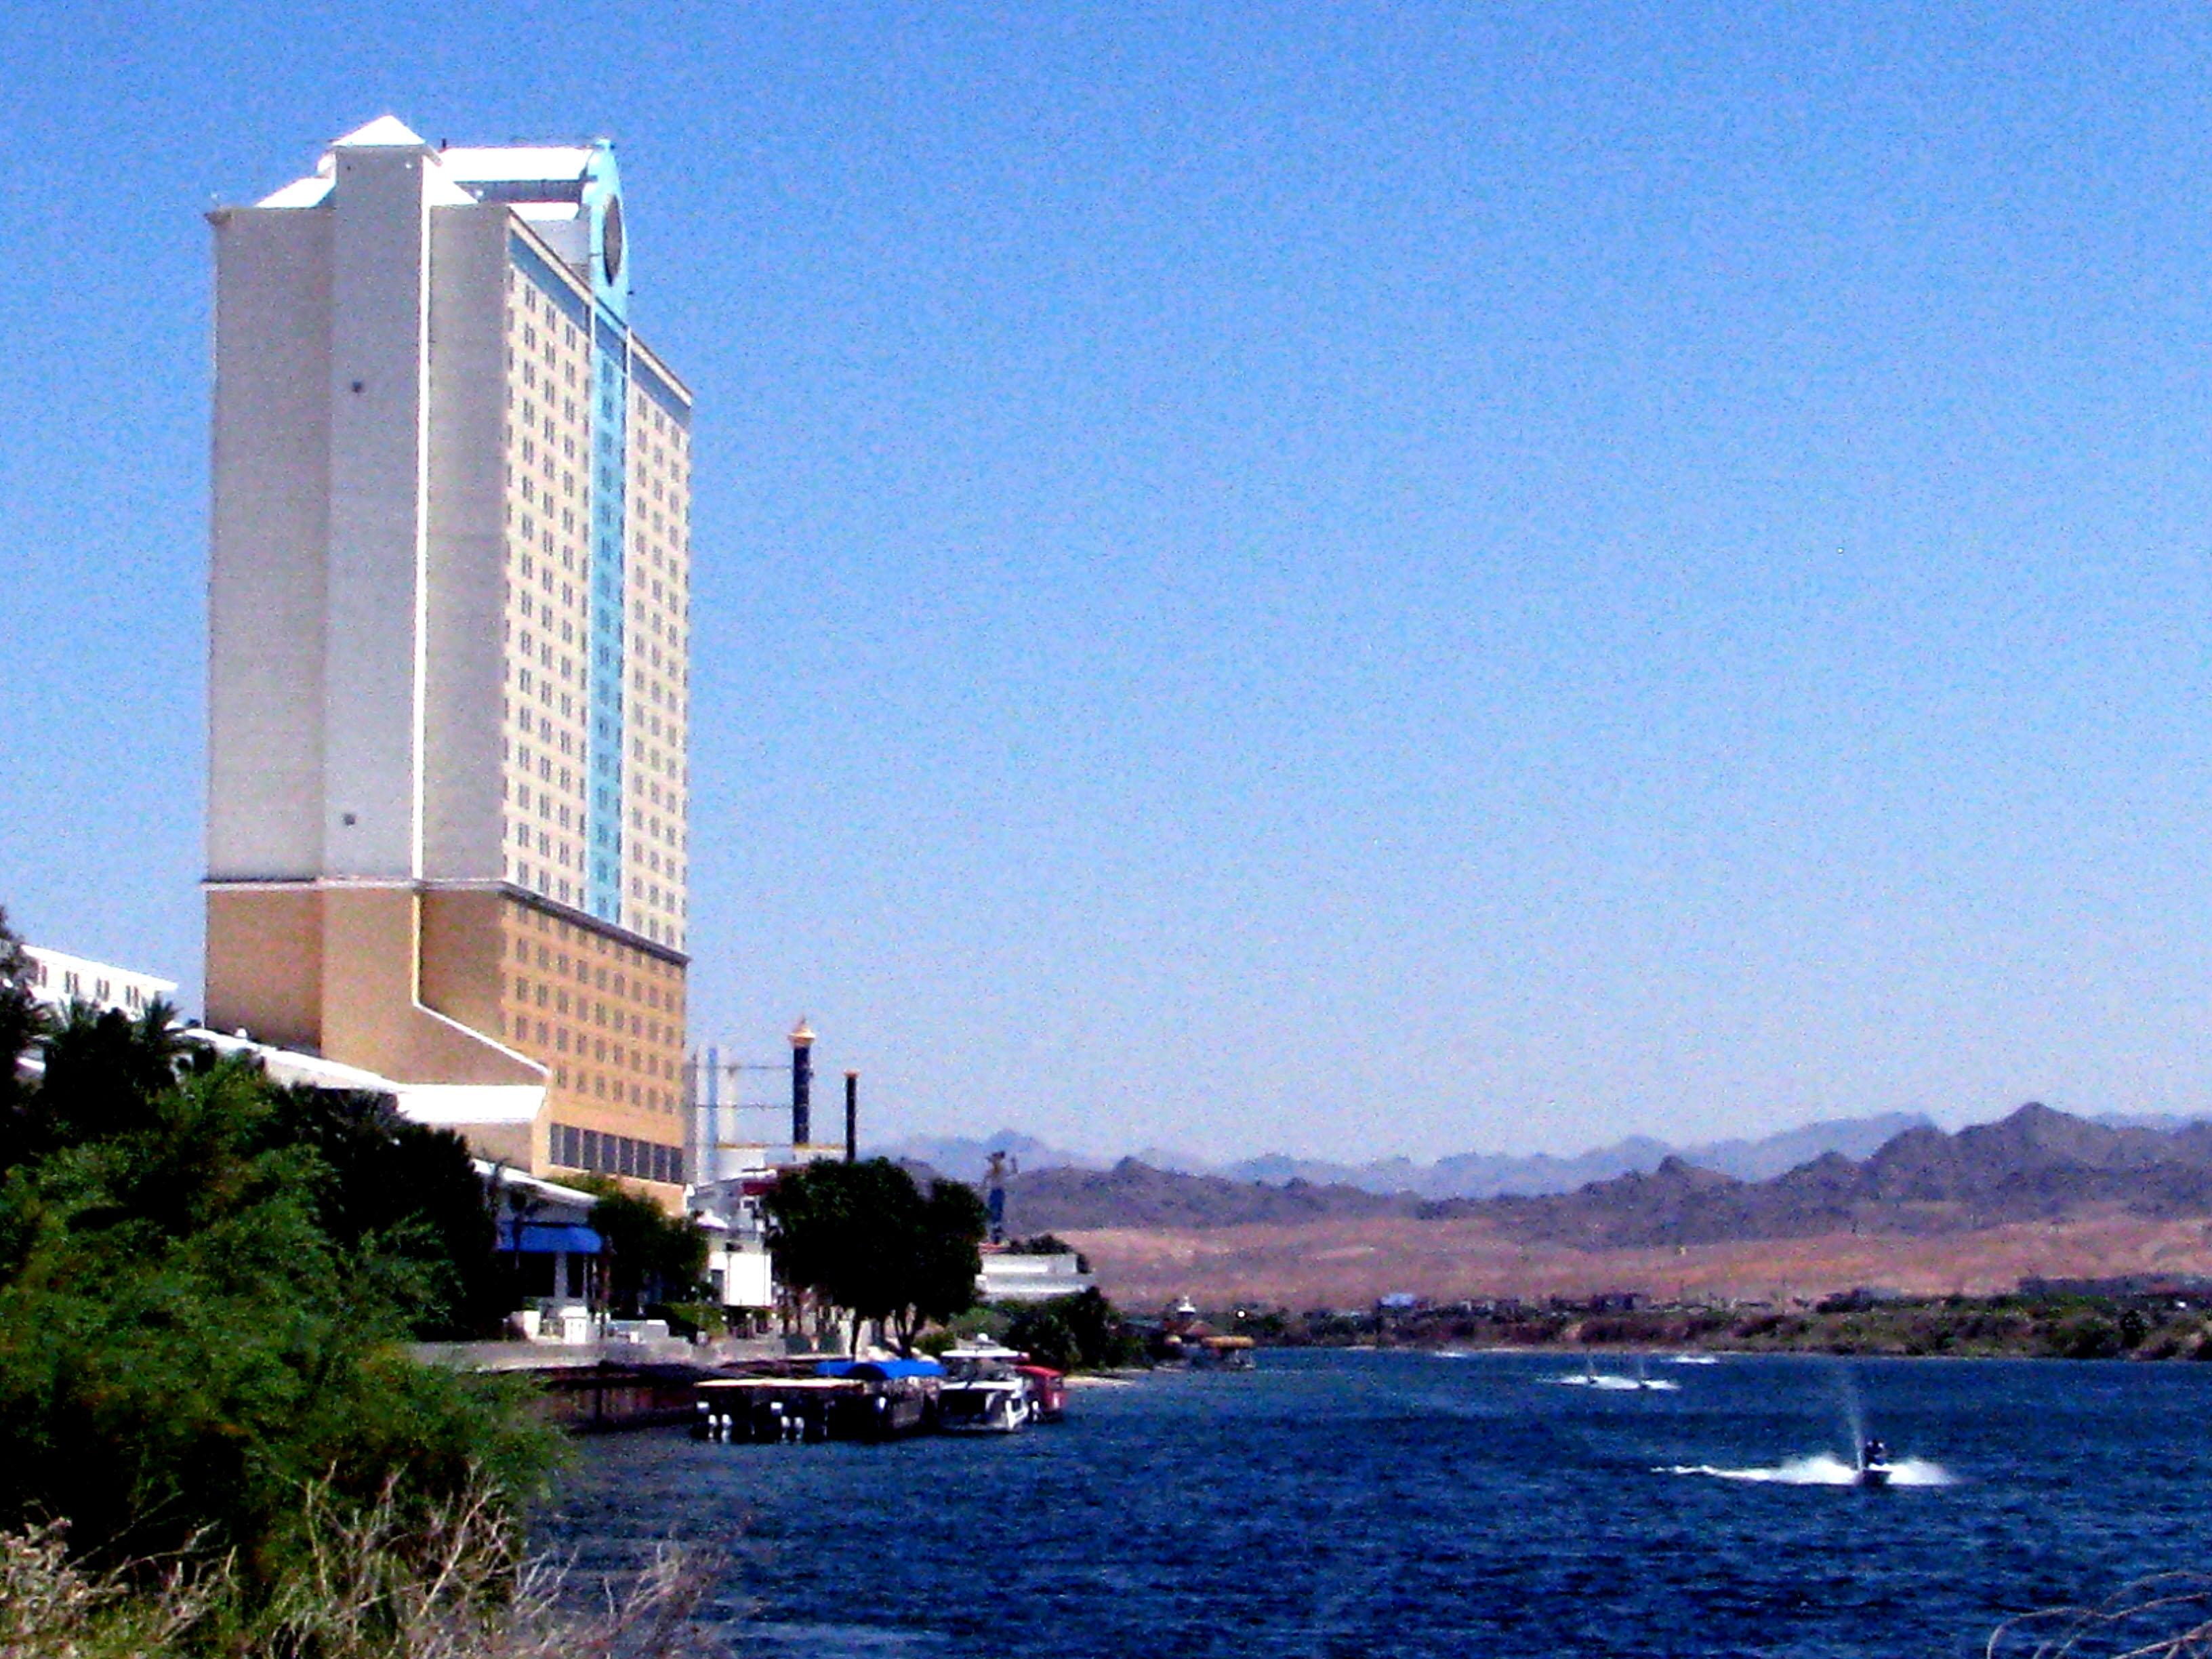 River palms casino in laughlin nv 2006 blogid casino cialis inurl january viagra